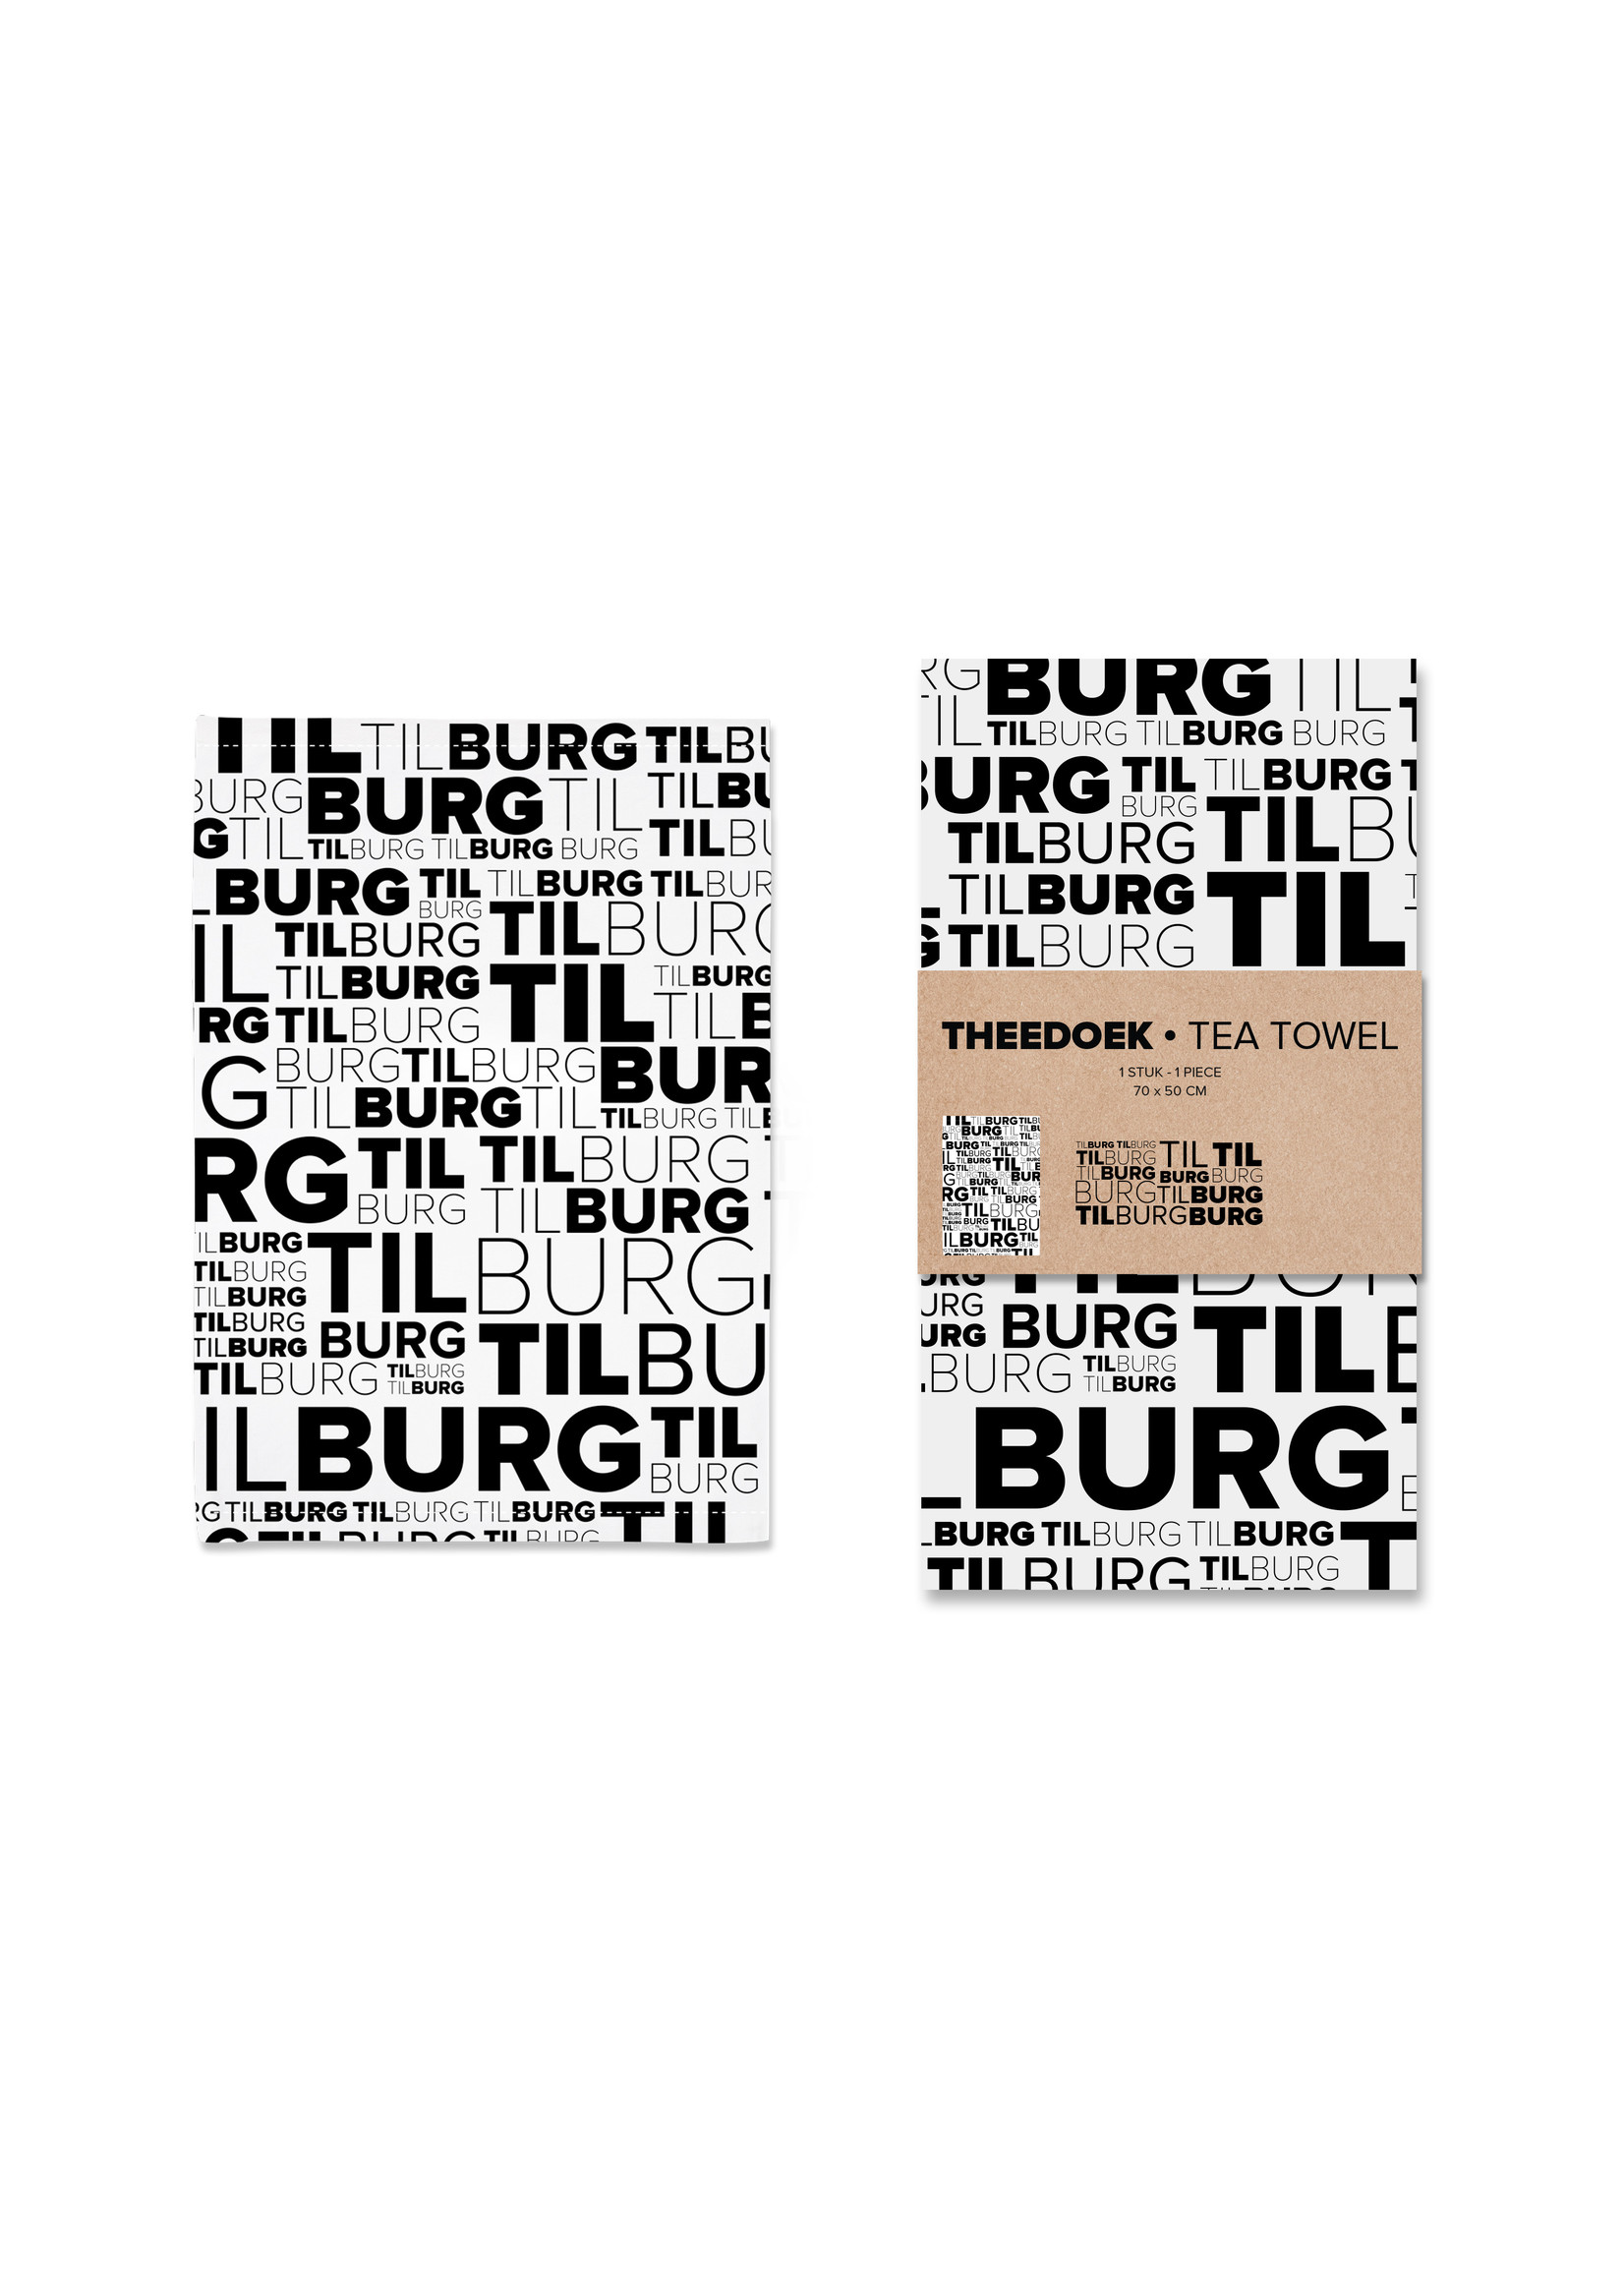 THEEDOEK TILBURG